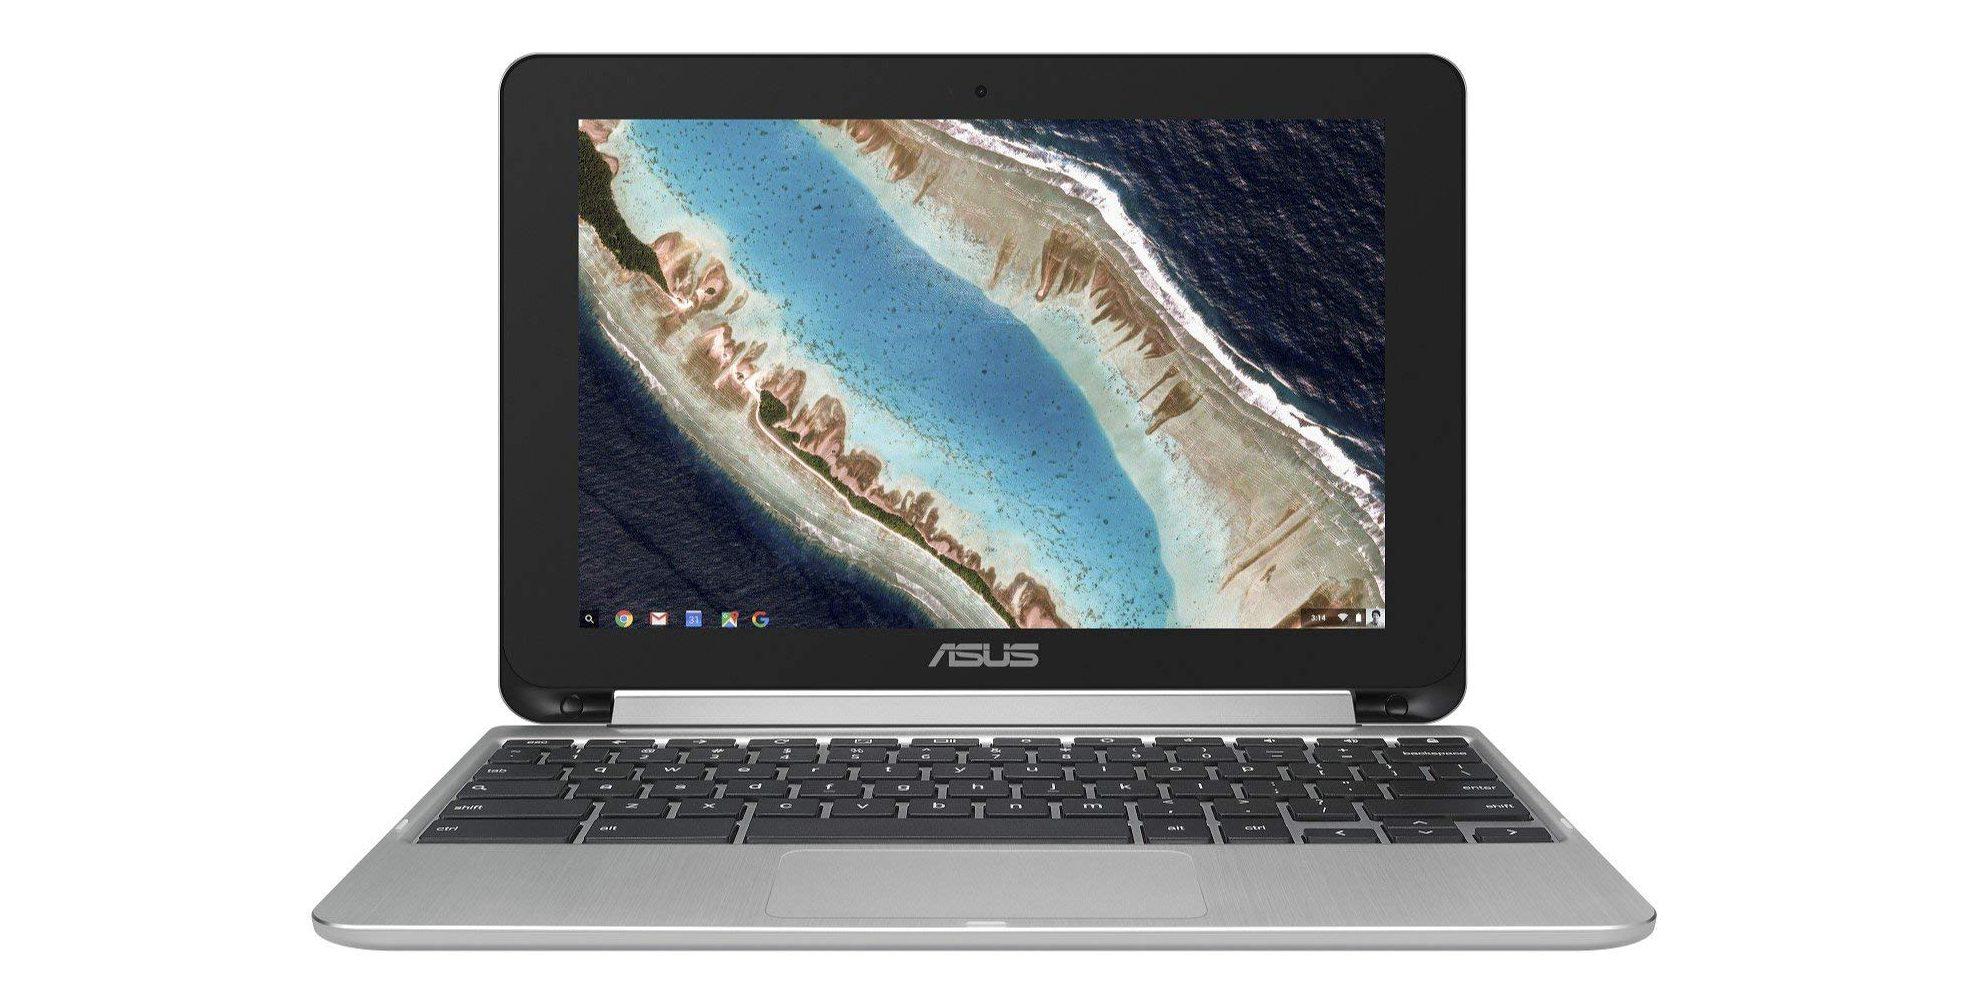 9to5Toys Letzter Anruf: Google Pixel 2 XL 300 $ Rabatt, ASUS 10-Zoll-Chromebook 250 $, SanDisk Wireless Flash Drive 23 $, mehr